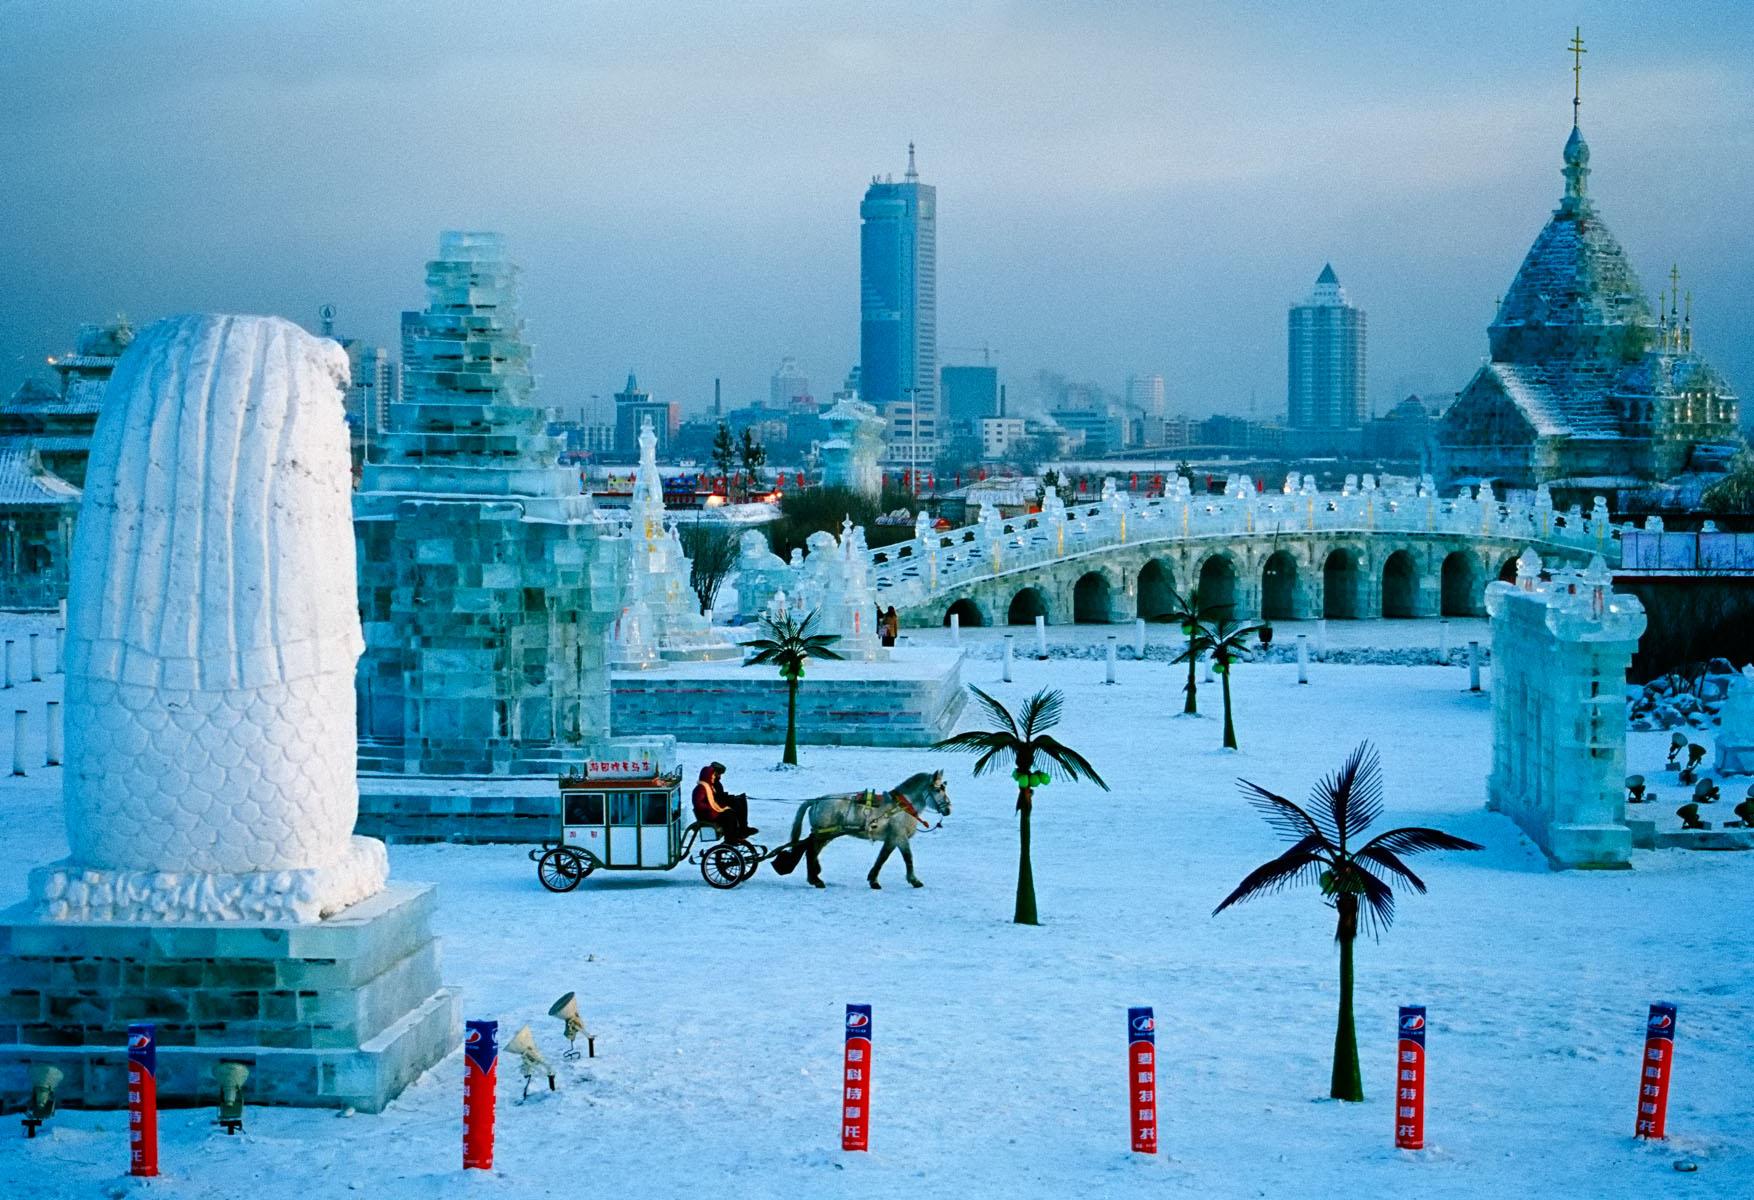 Harbin - City of Ice